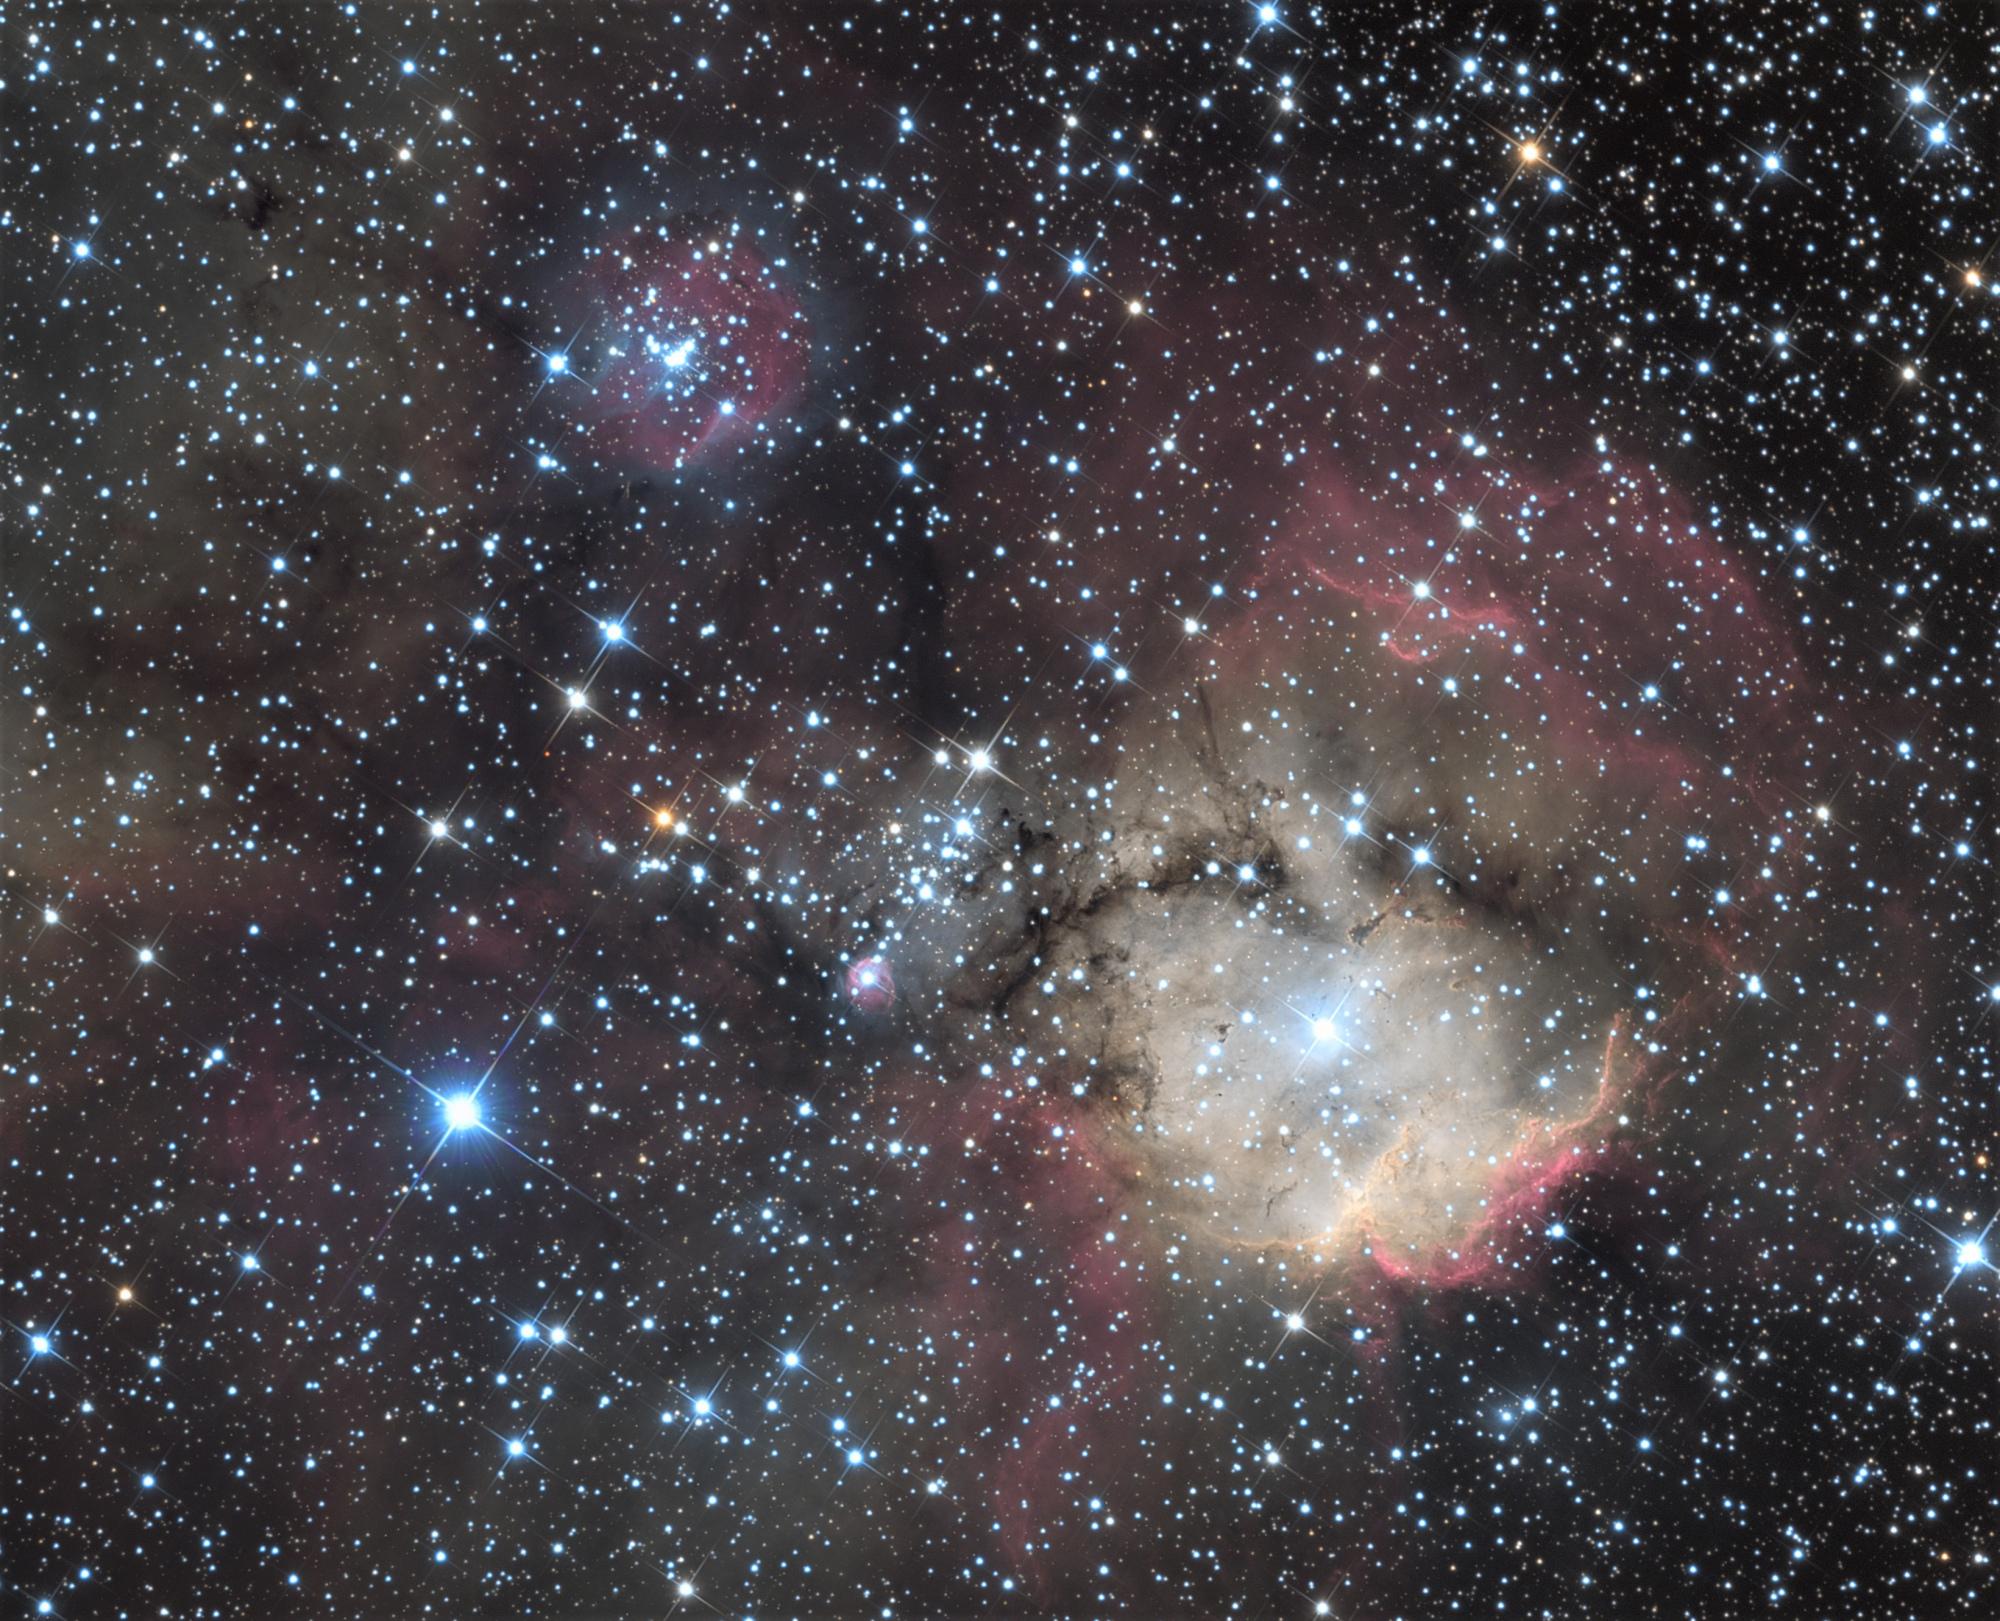 NGC2467LRVB-Final2-Crop.thumb.jpg.e35d72b1c68fc73e11332dbd8bb9208a.jpg